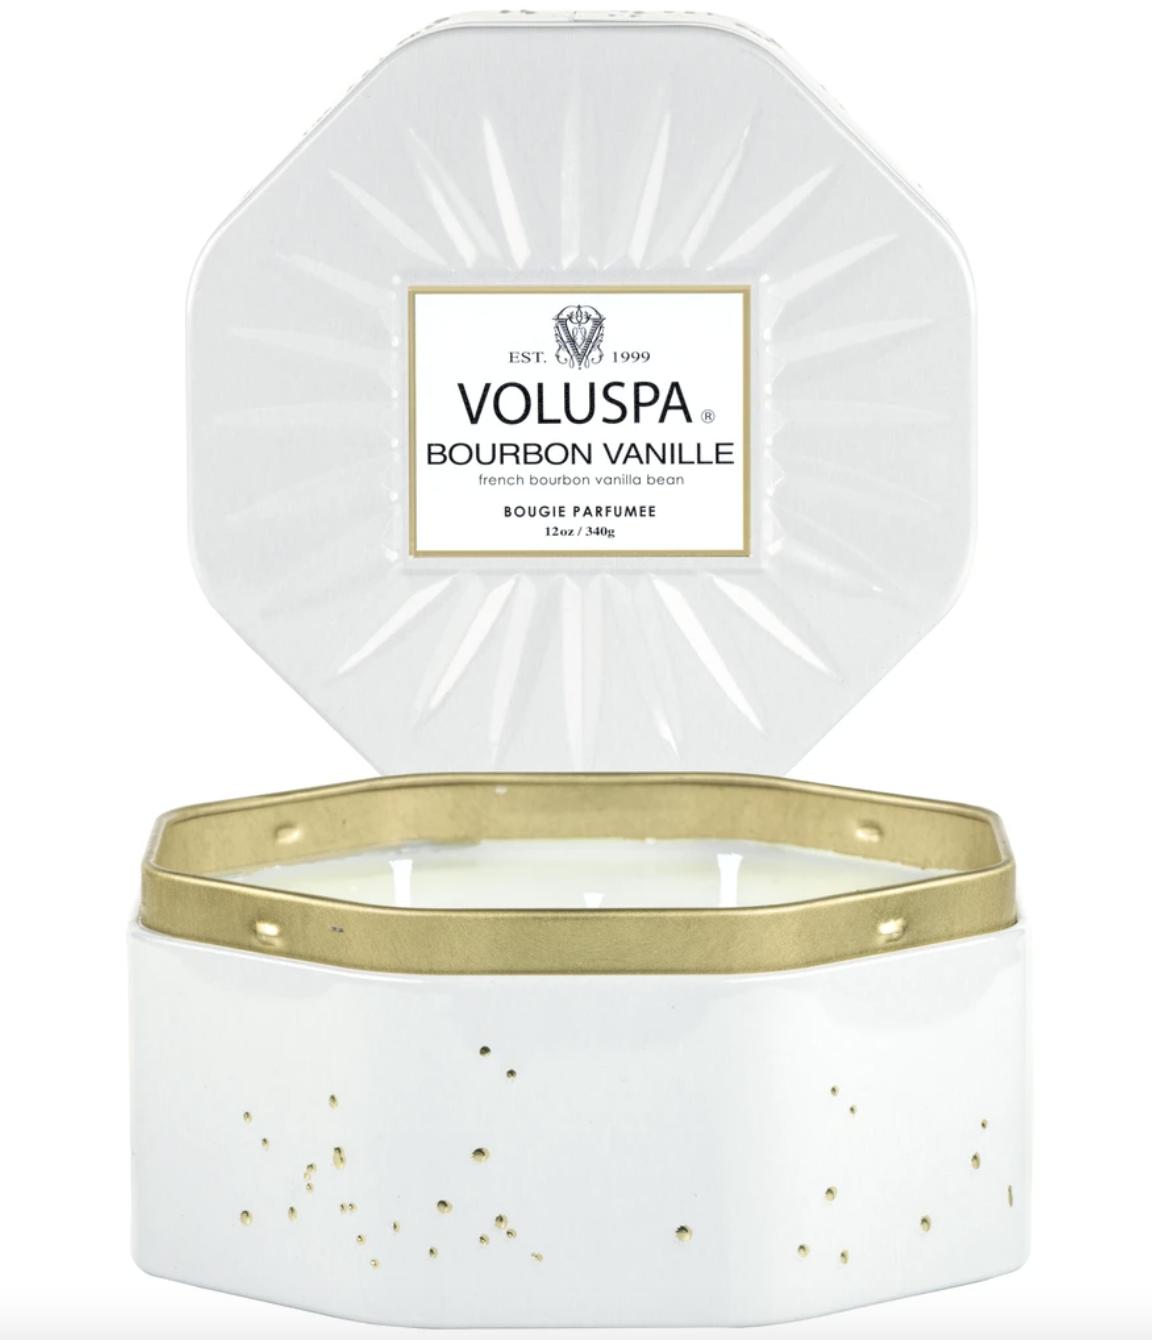 Voluspa Bourbon Vanille, Octagon Tin 3-Wick Candle